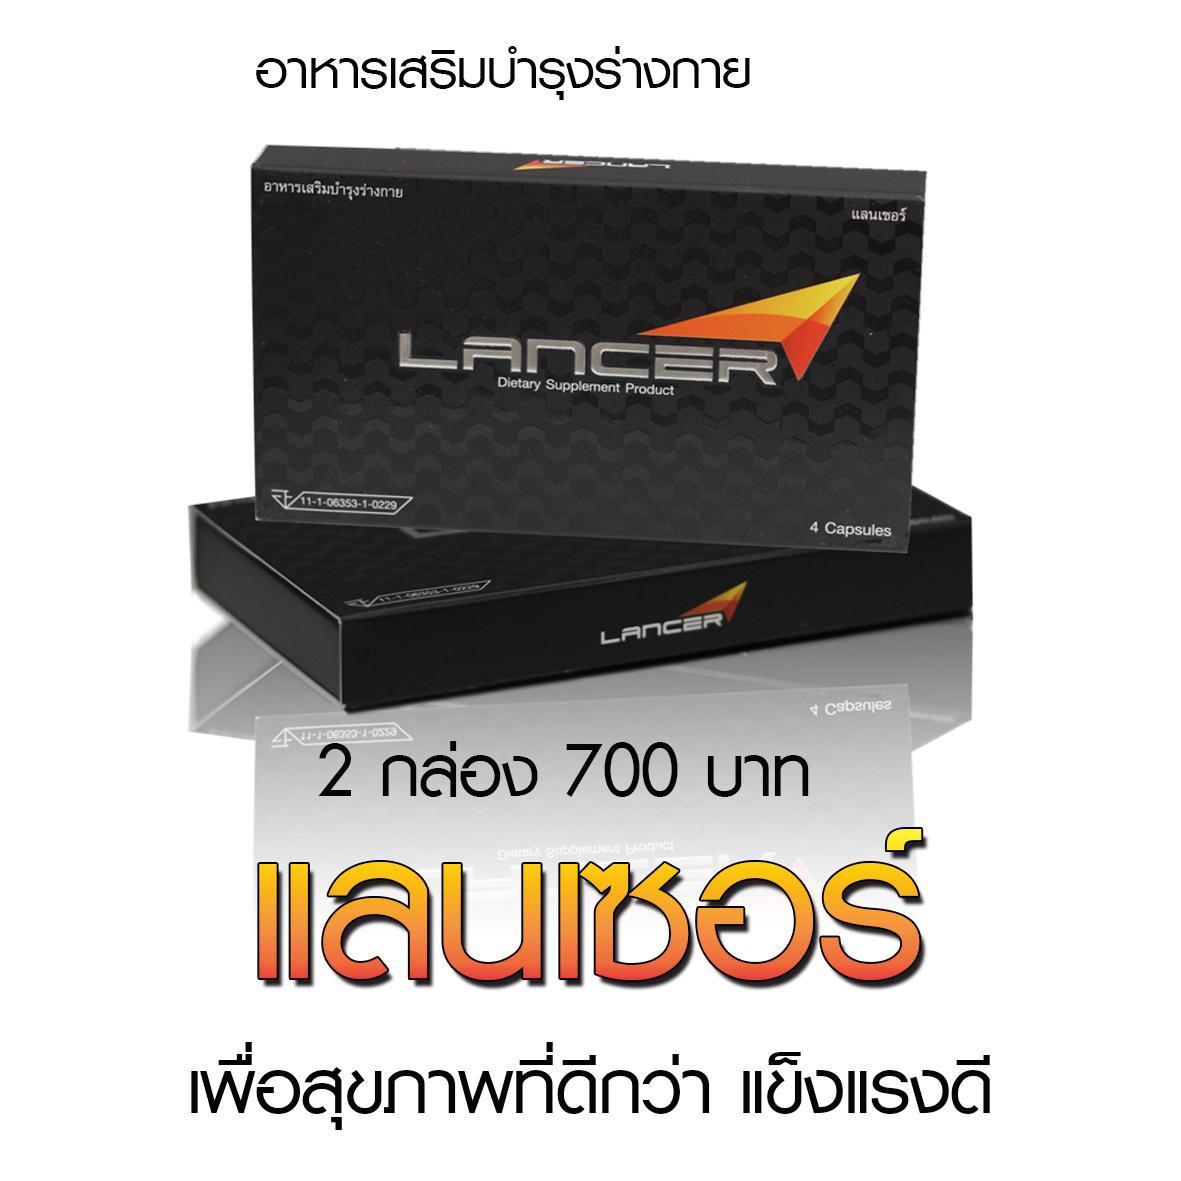 Lancer 2 กล่อง